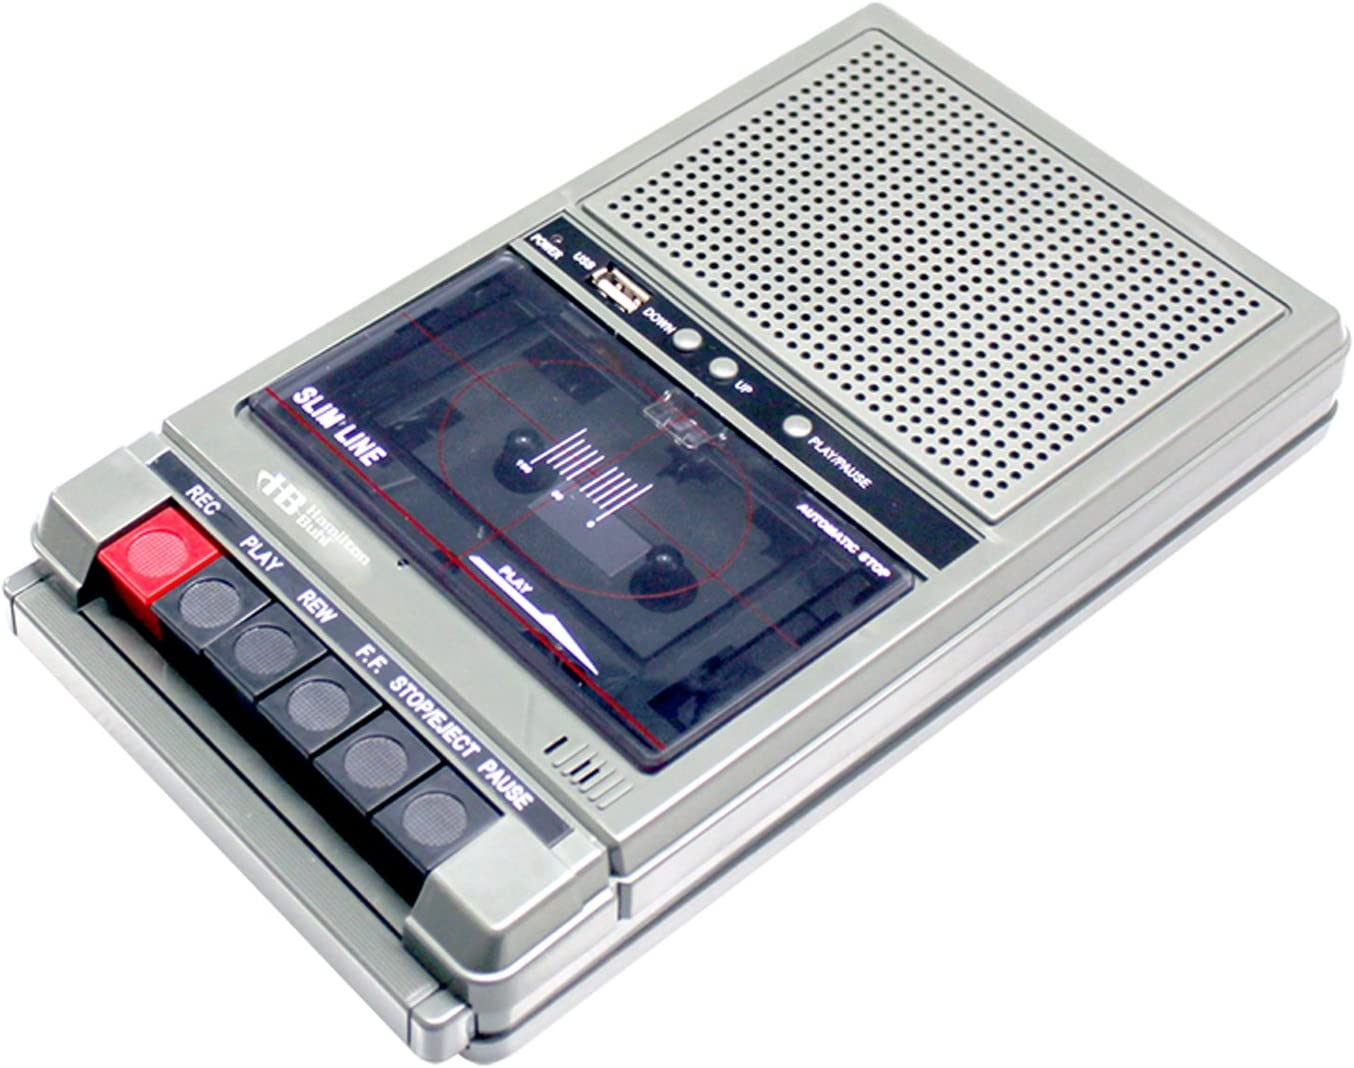 Hamilton Buhl Classroom Cassette Player Station D132 Max 40% OFF 2 Popular products Watt 1